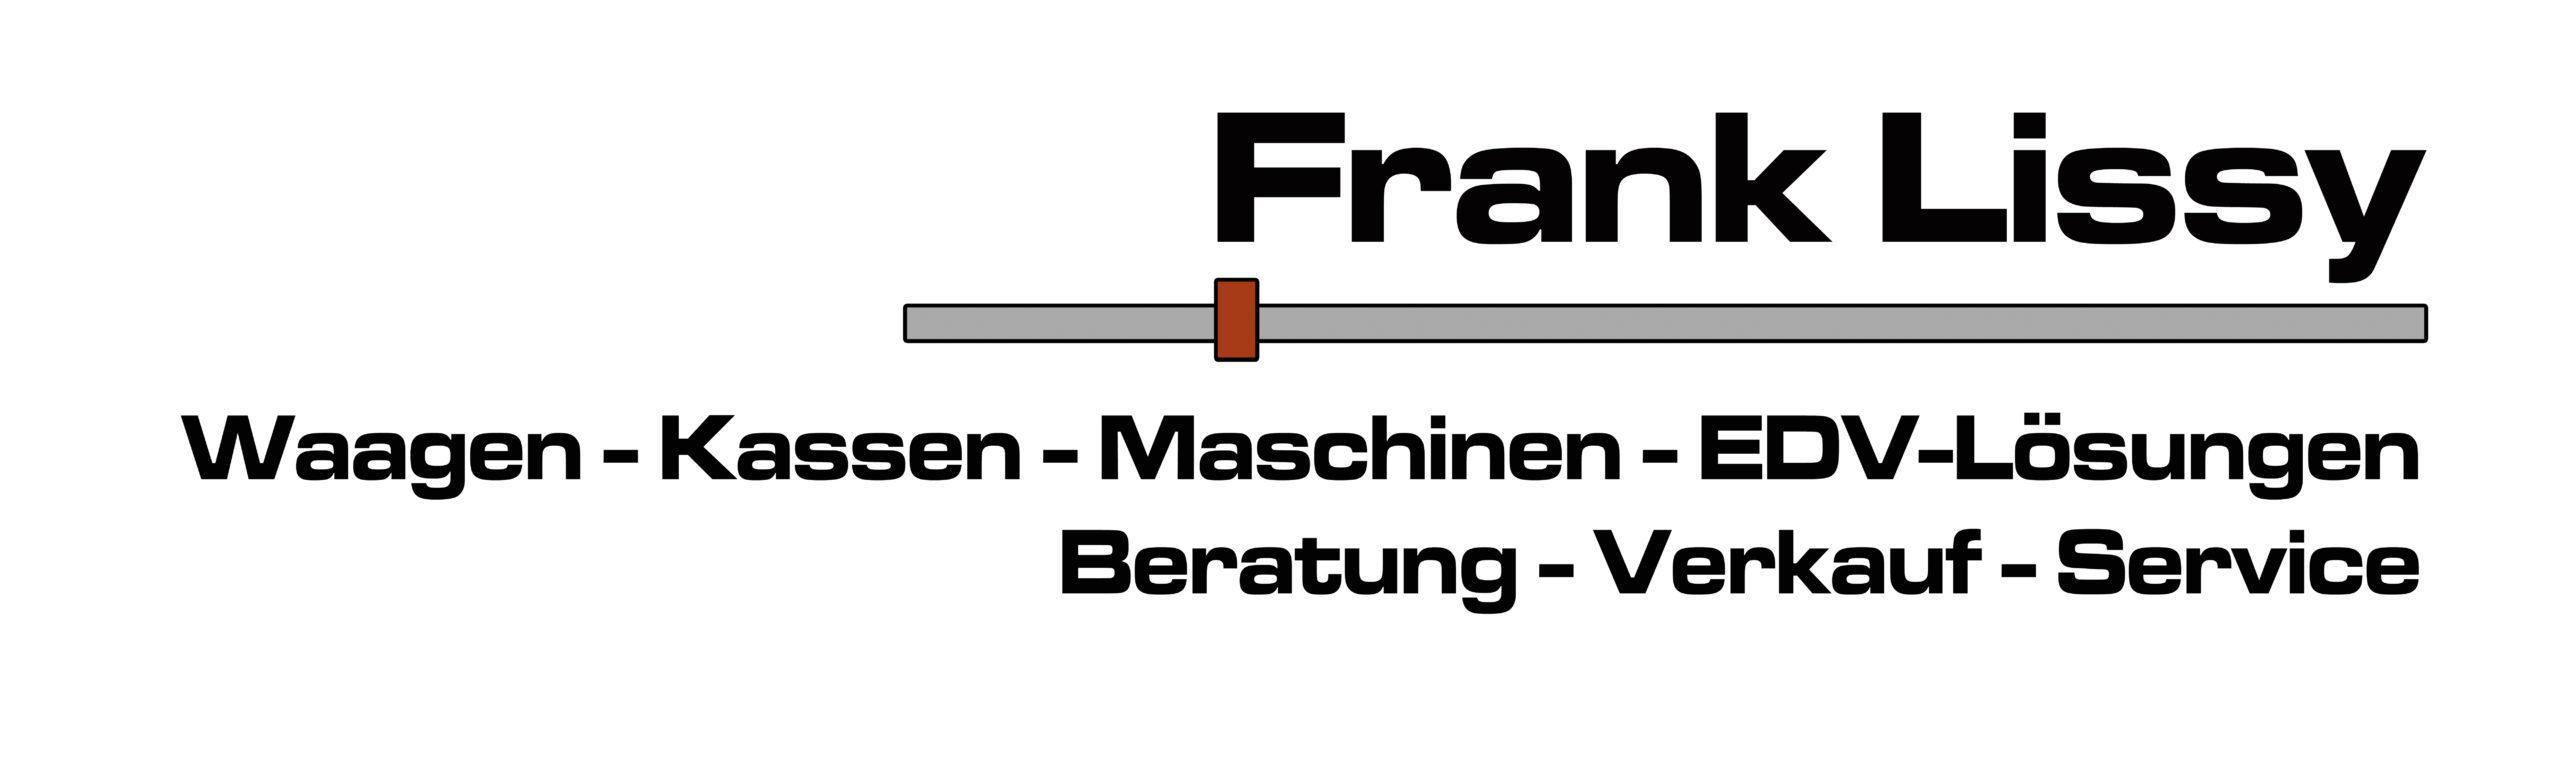 Frank Lissy Handel & Service